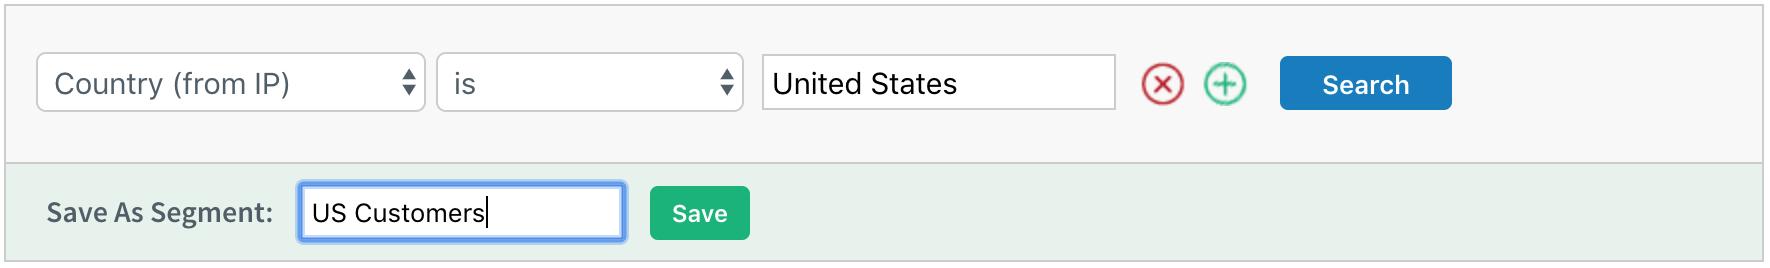 Segment subscribers based on location